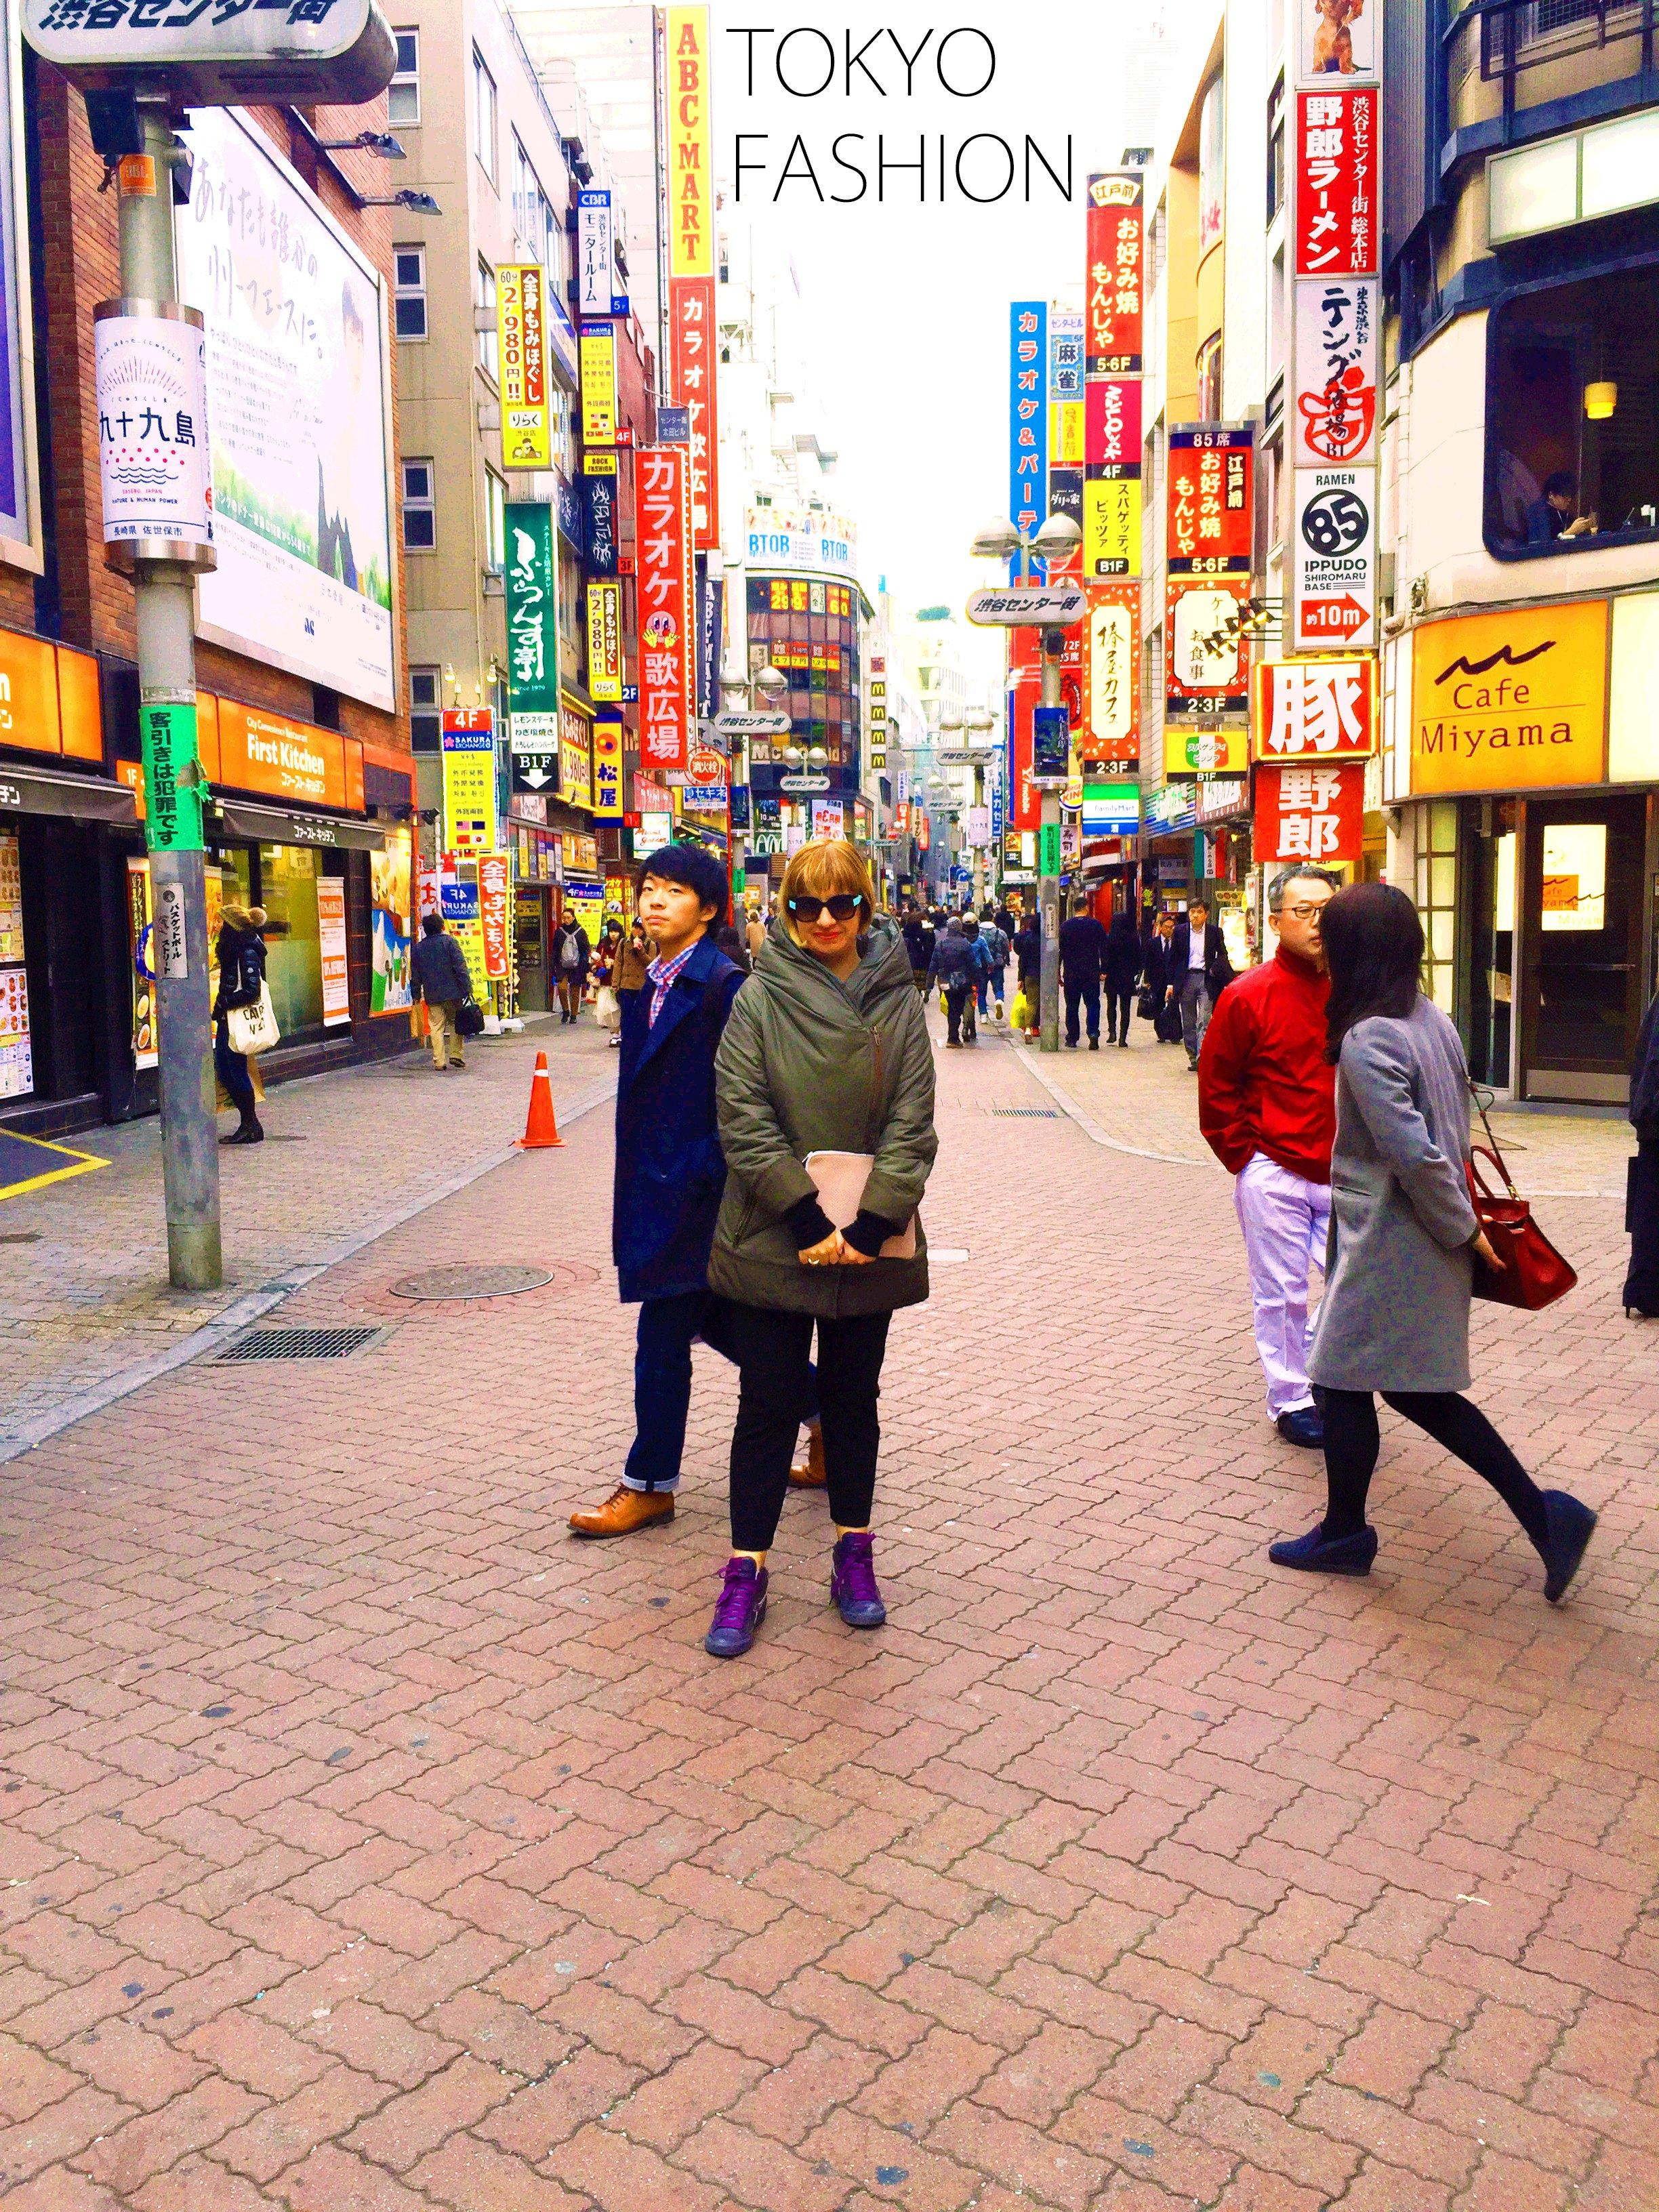 Tokyo Fashion a Shibuya